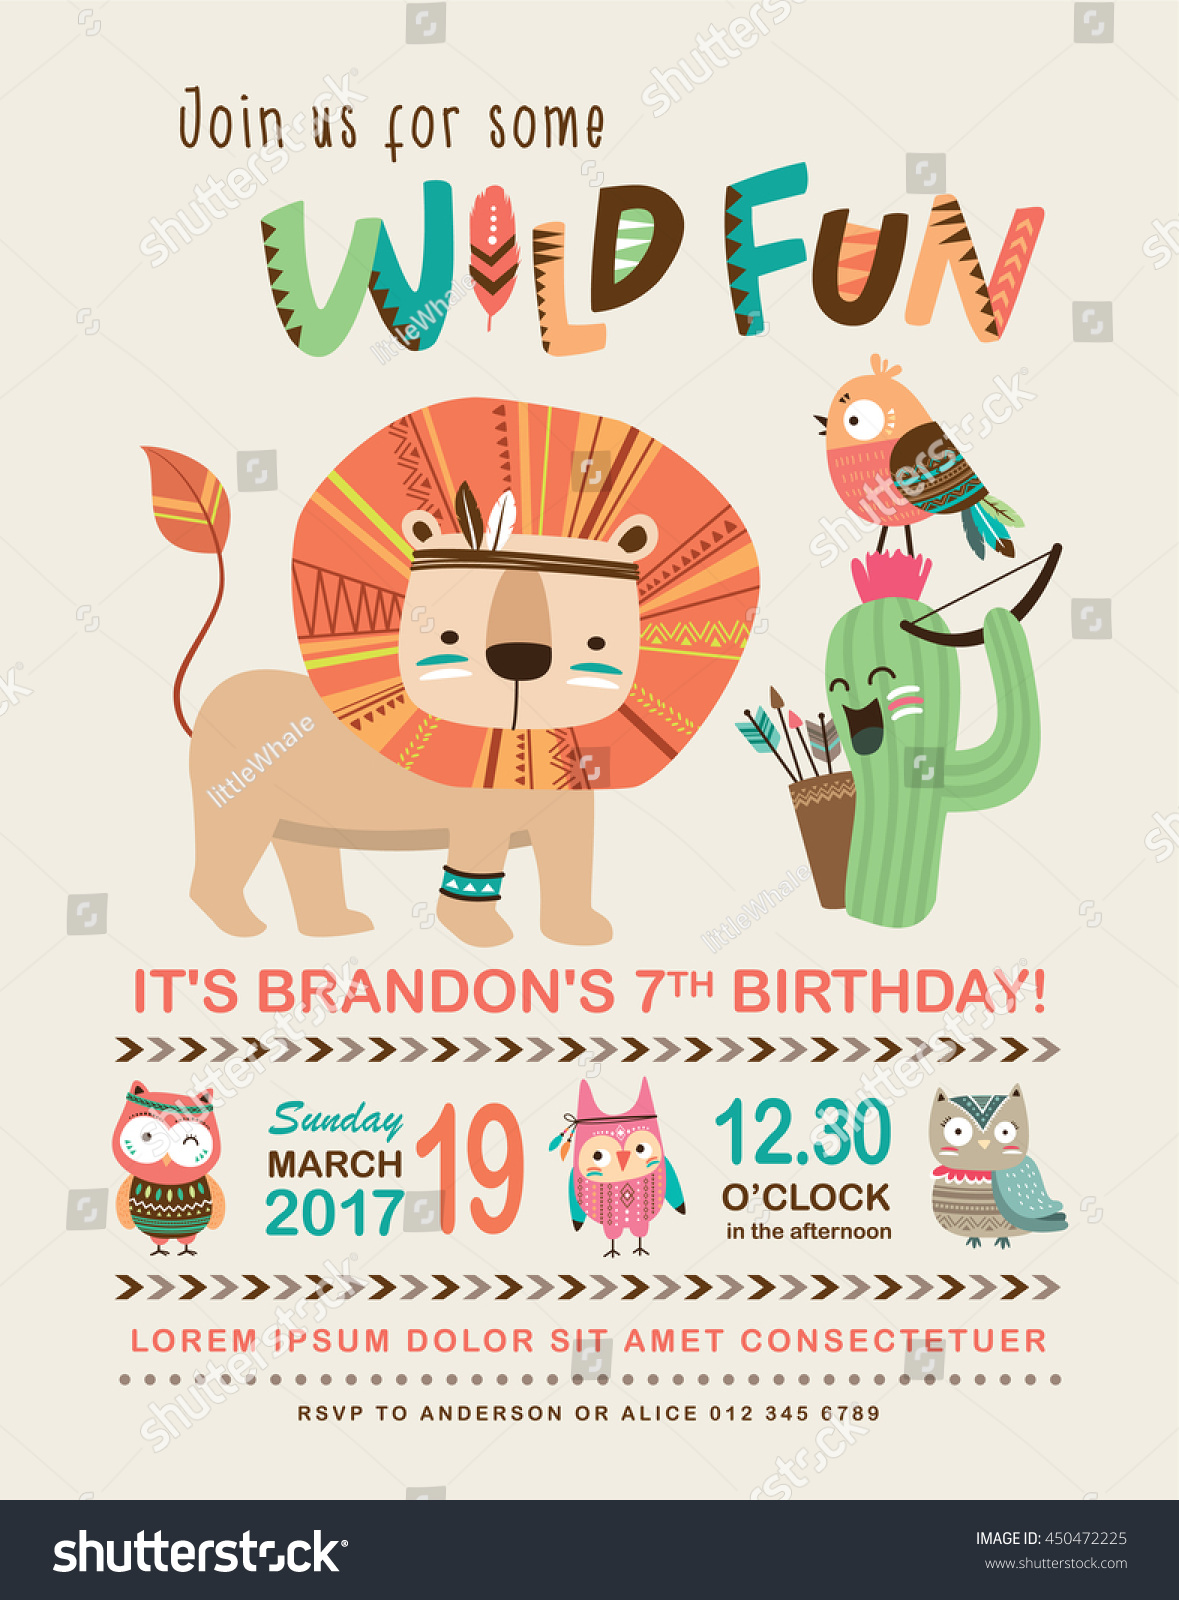 Kids Birthday Invitation Card Cute Cartoon Stock Vector 450472225 ...